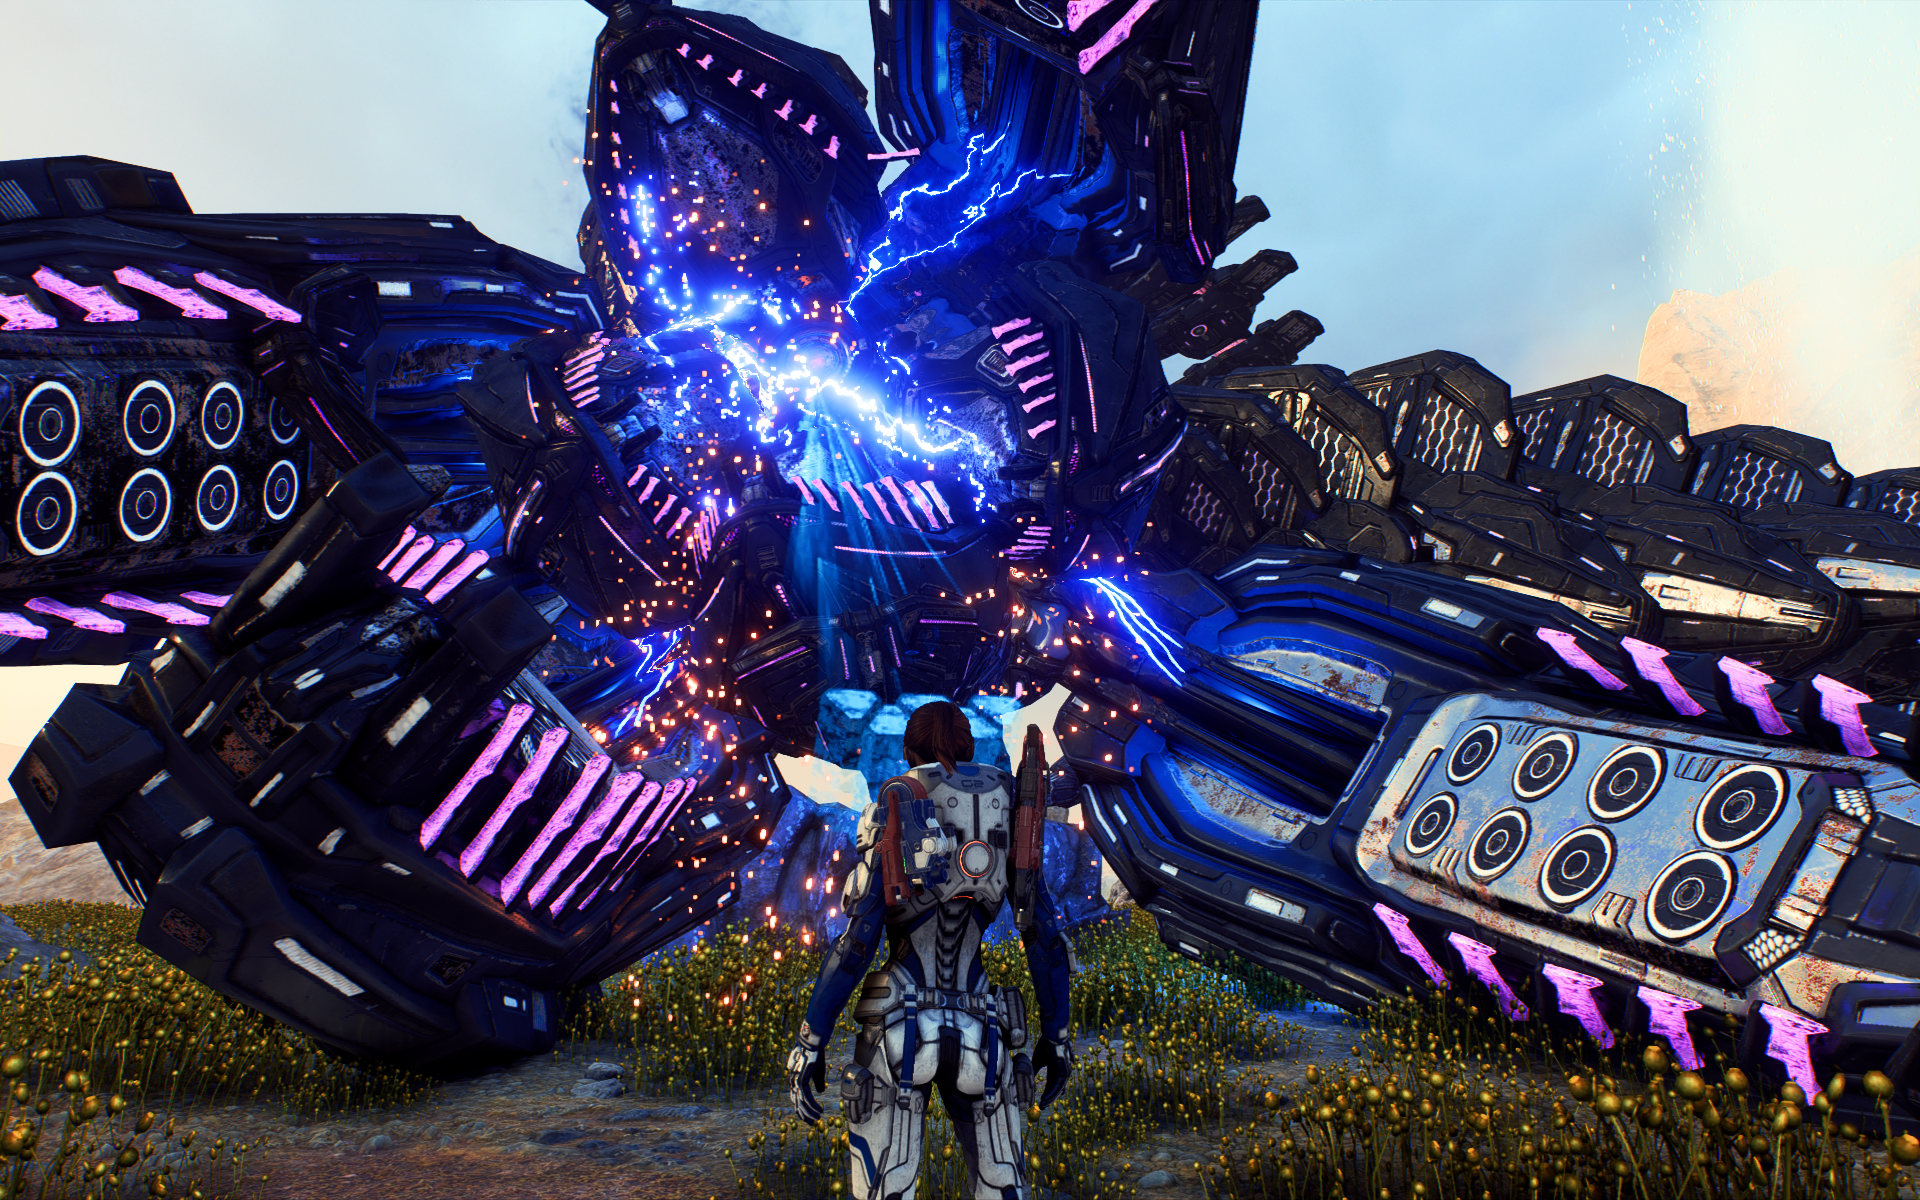 Mass Effect Andromeda Screenshot  - 07.11.26.31.png - Mass Effect: Andromeda